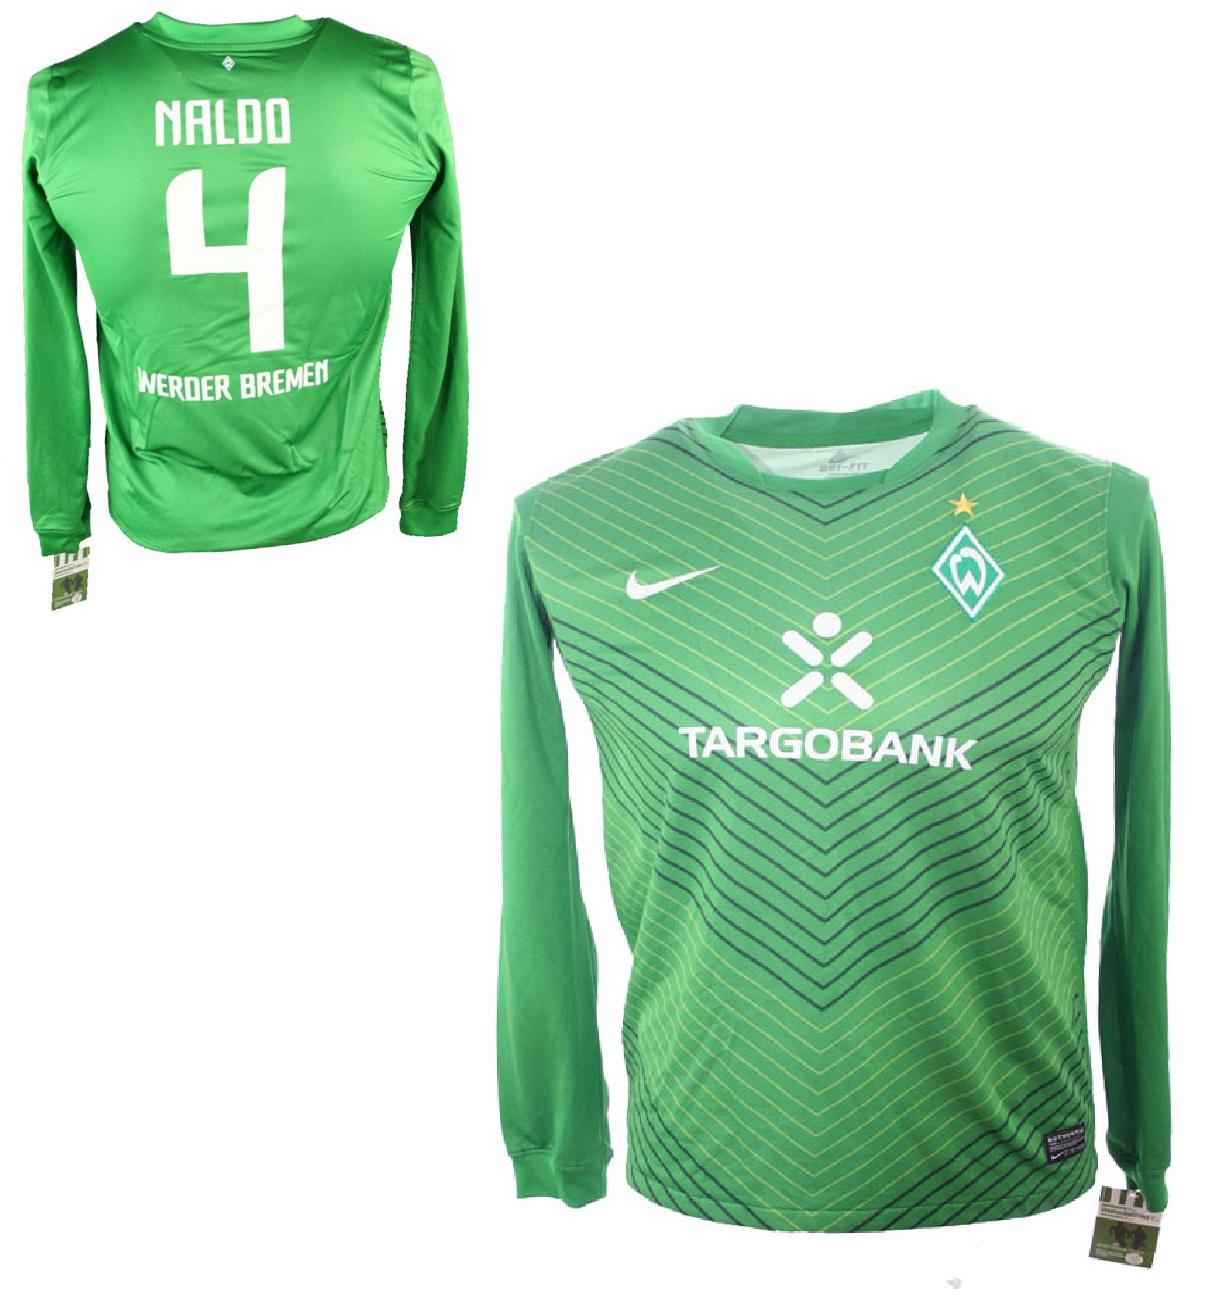 665dfd56c5b30 Nike SV Werder Bremen jersey 4 Naldo 2011/12 green home men's S-M 176cm